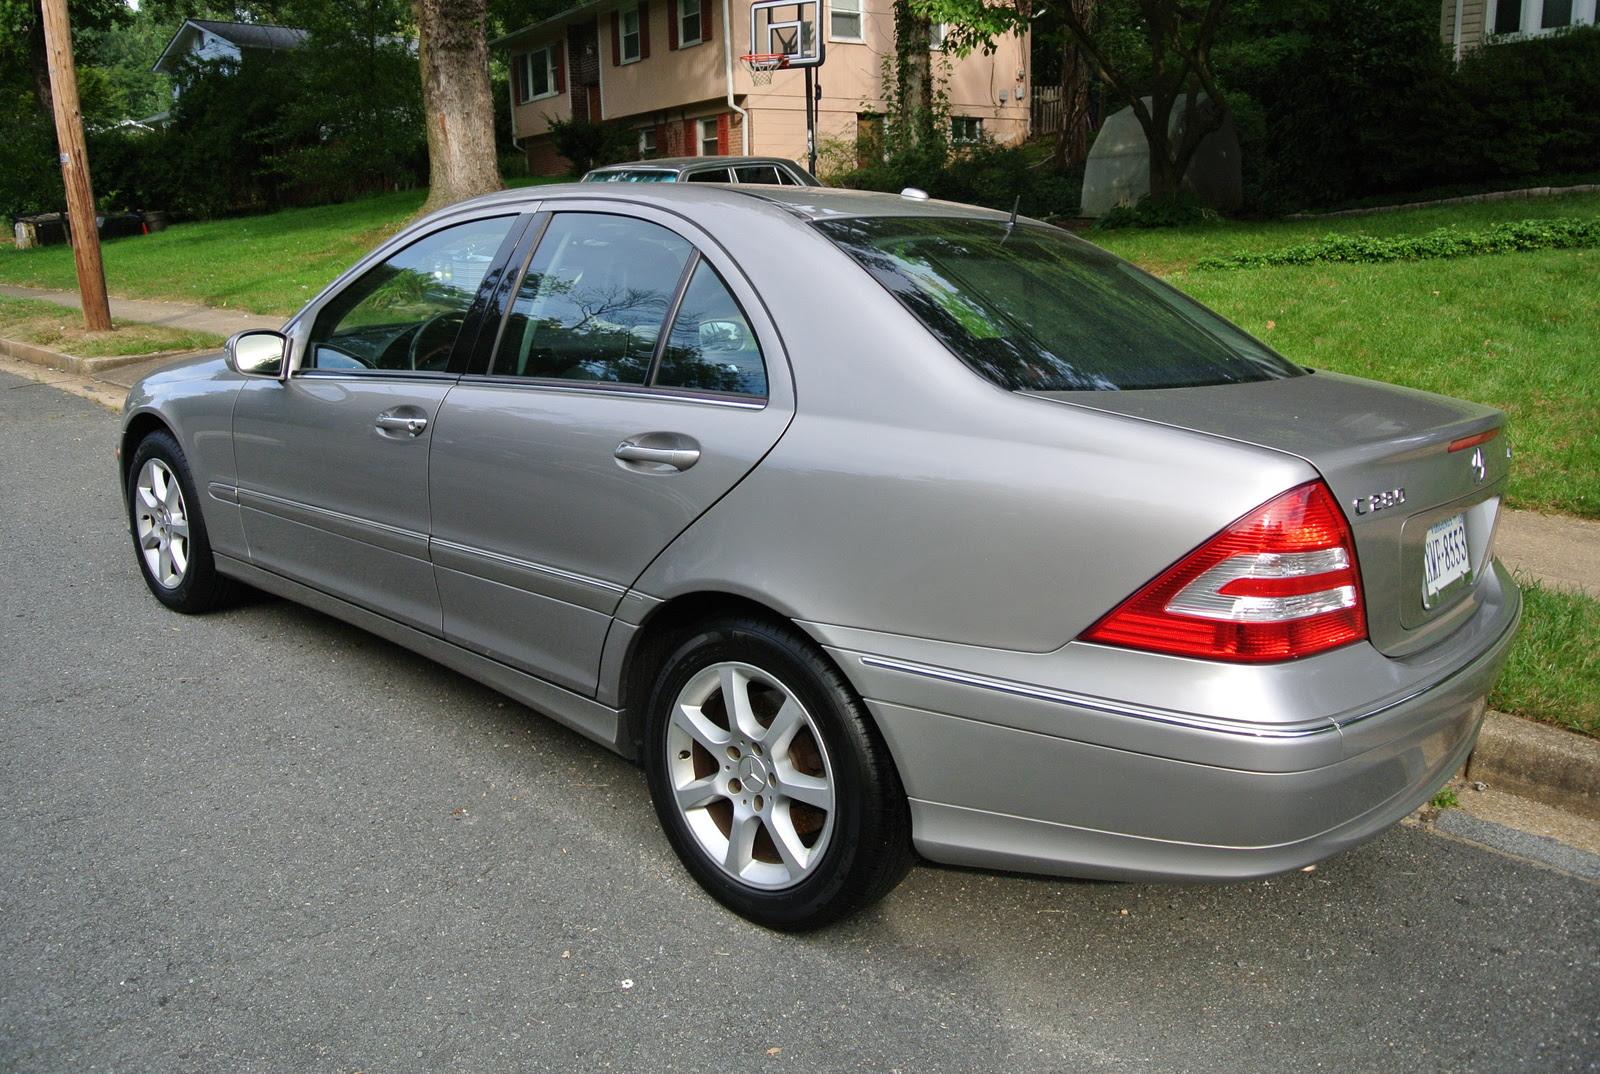 2007 Mercedes-Benz C-Class - Trim Information - CarGurus